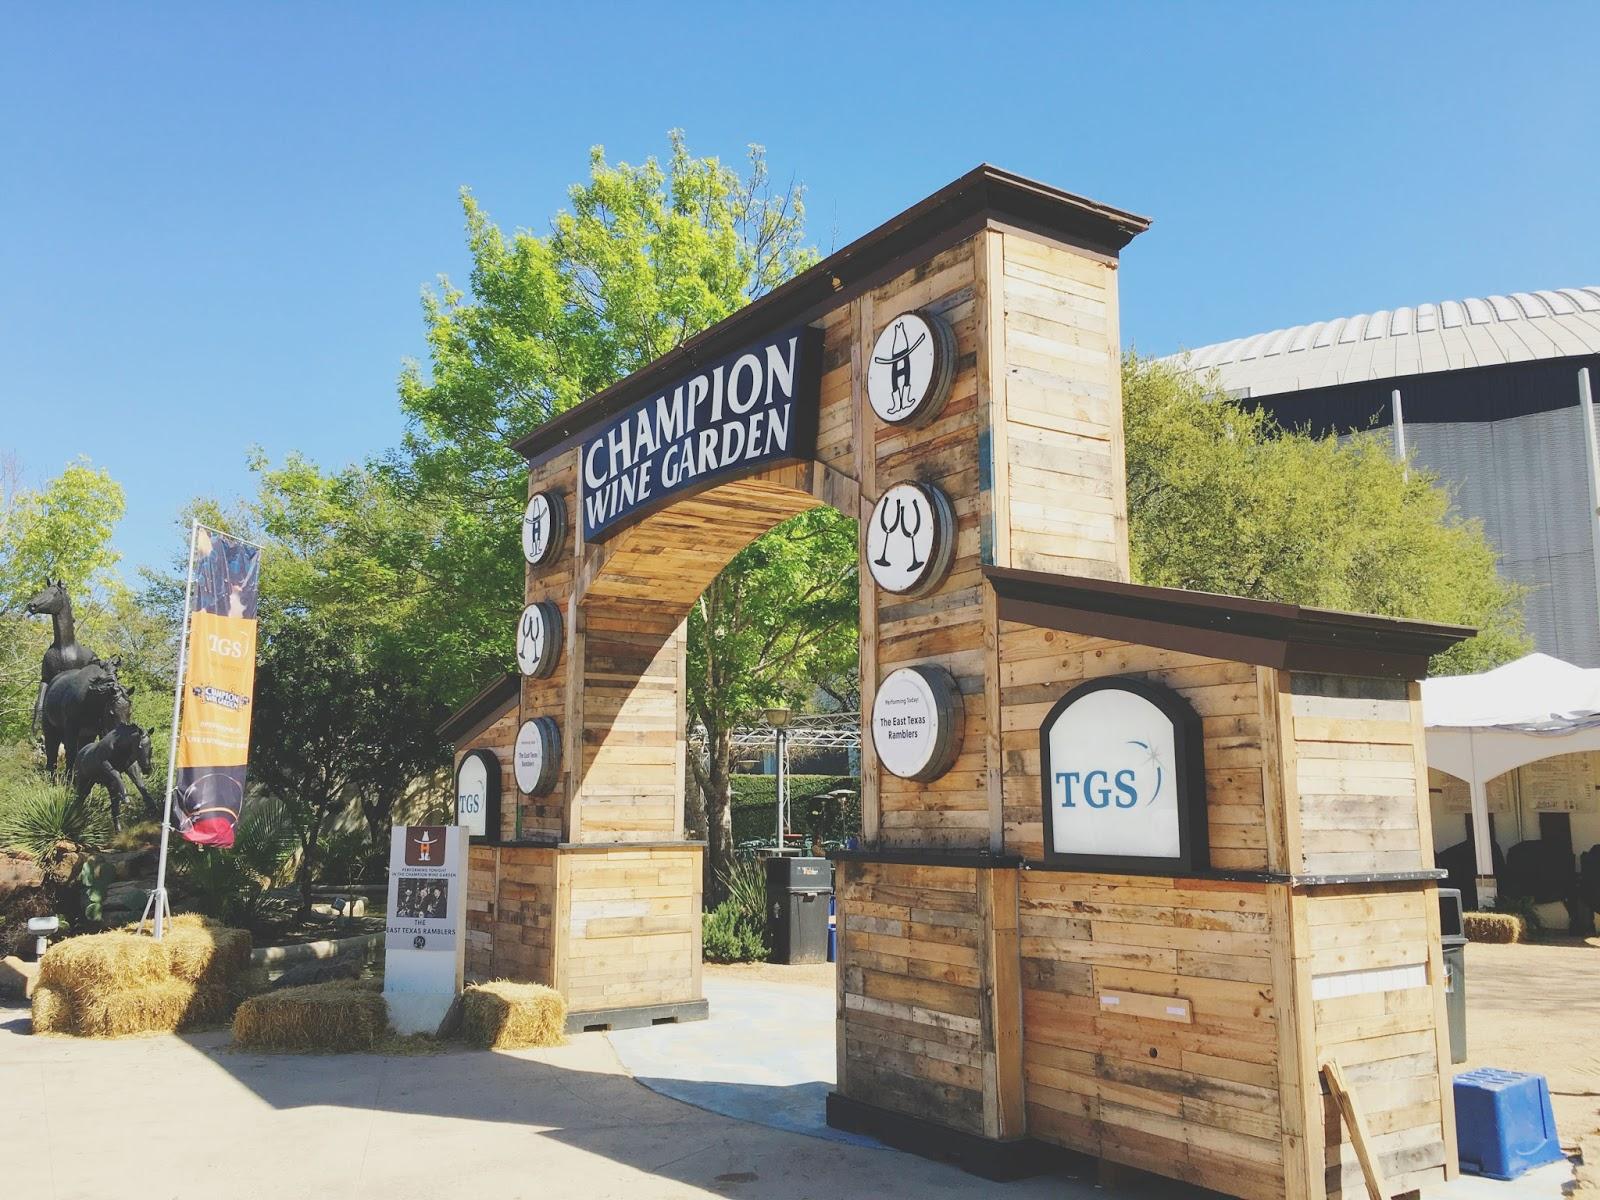 2016 Houston Livestock Show and Rodeo Champion Wine Garden